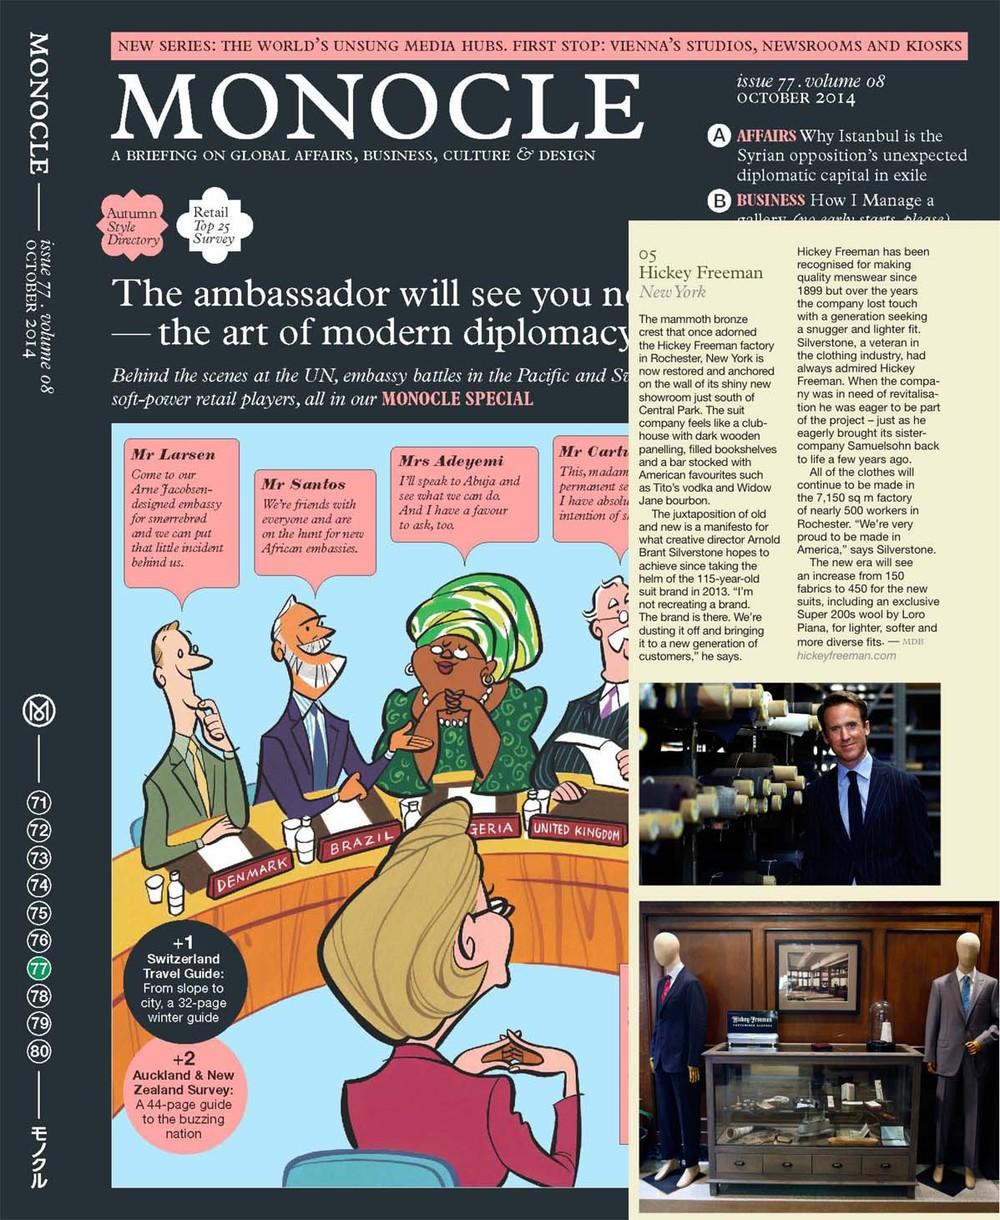 Monocle_HF_Oct2014-2.jpg